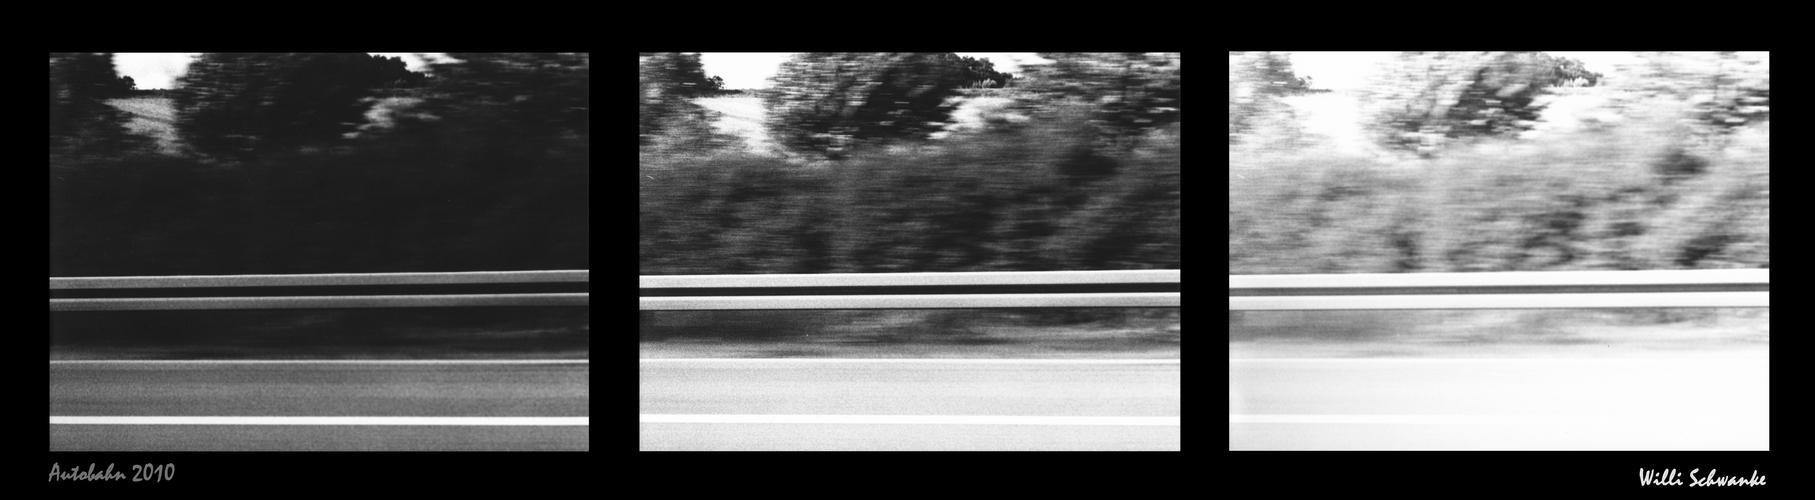 Autobahn - I -